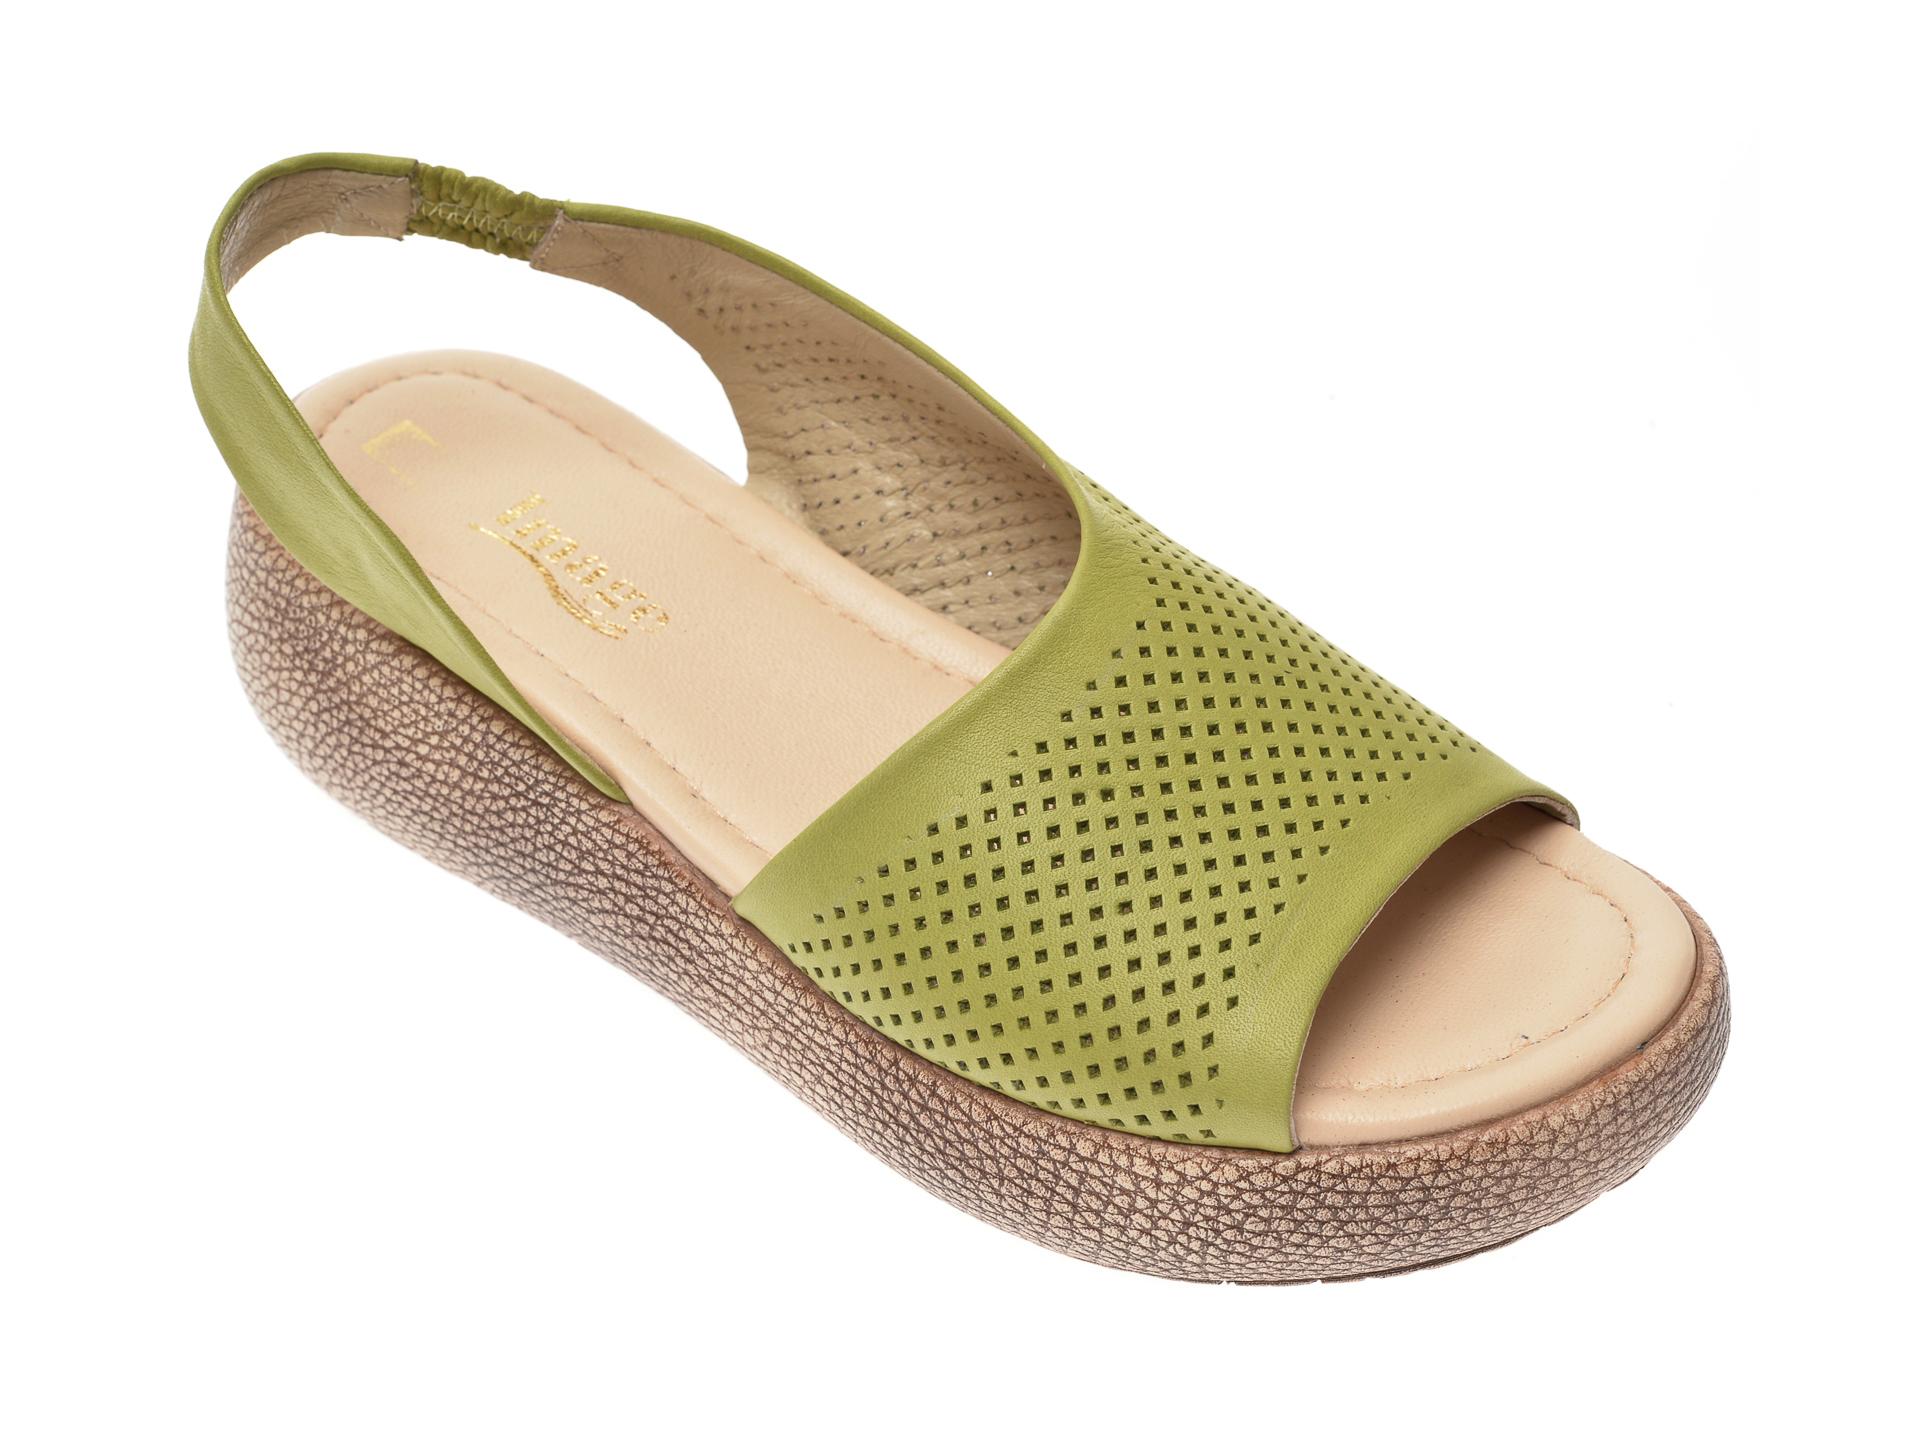 Sandale IMAGE verzi, 6033, din piele naturala imagine